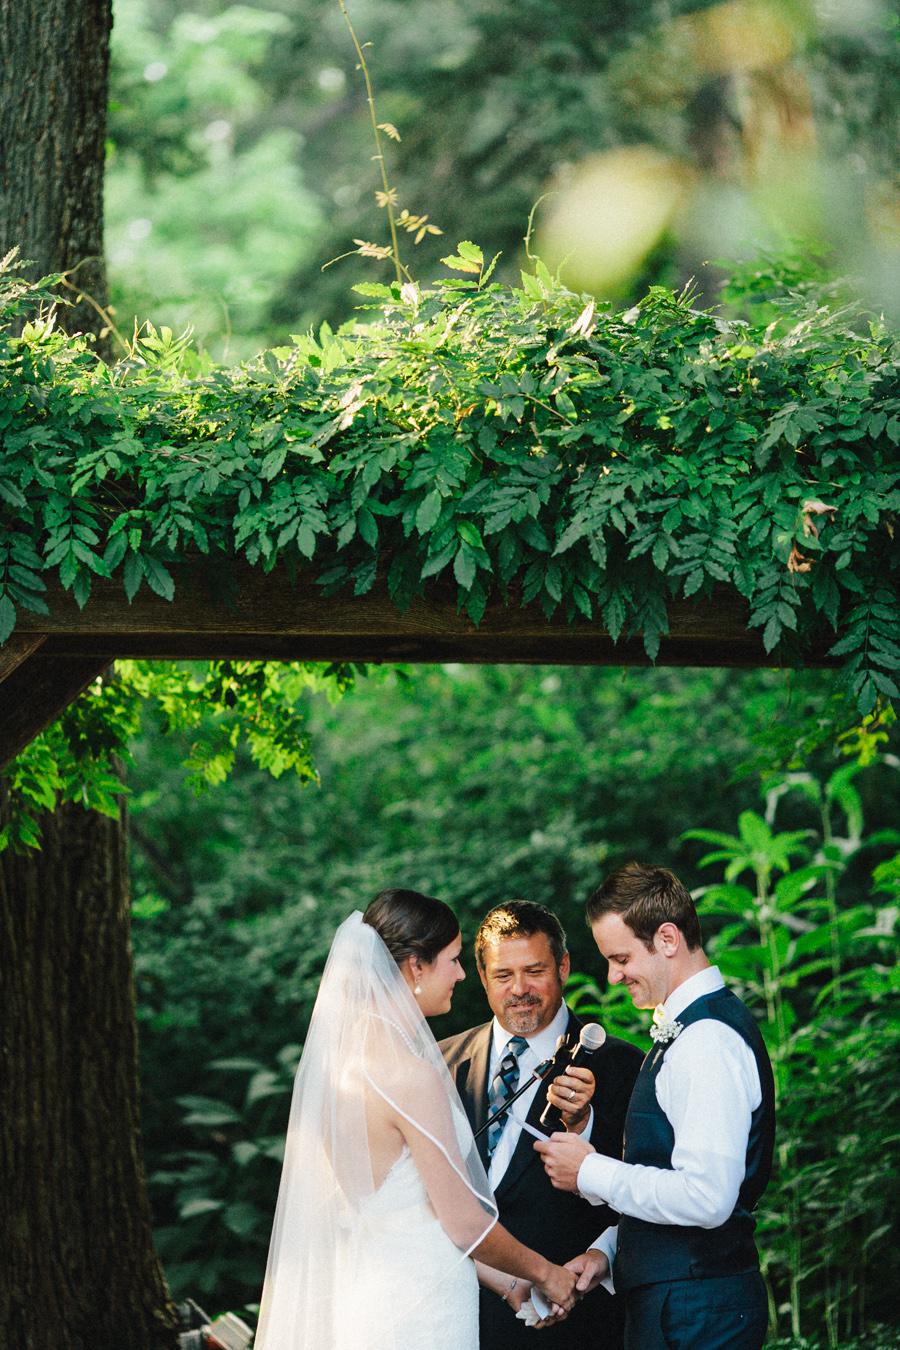 jolly_wedding_morton_arboretum-31.JPG